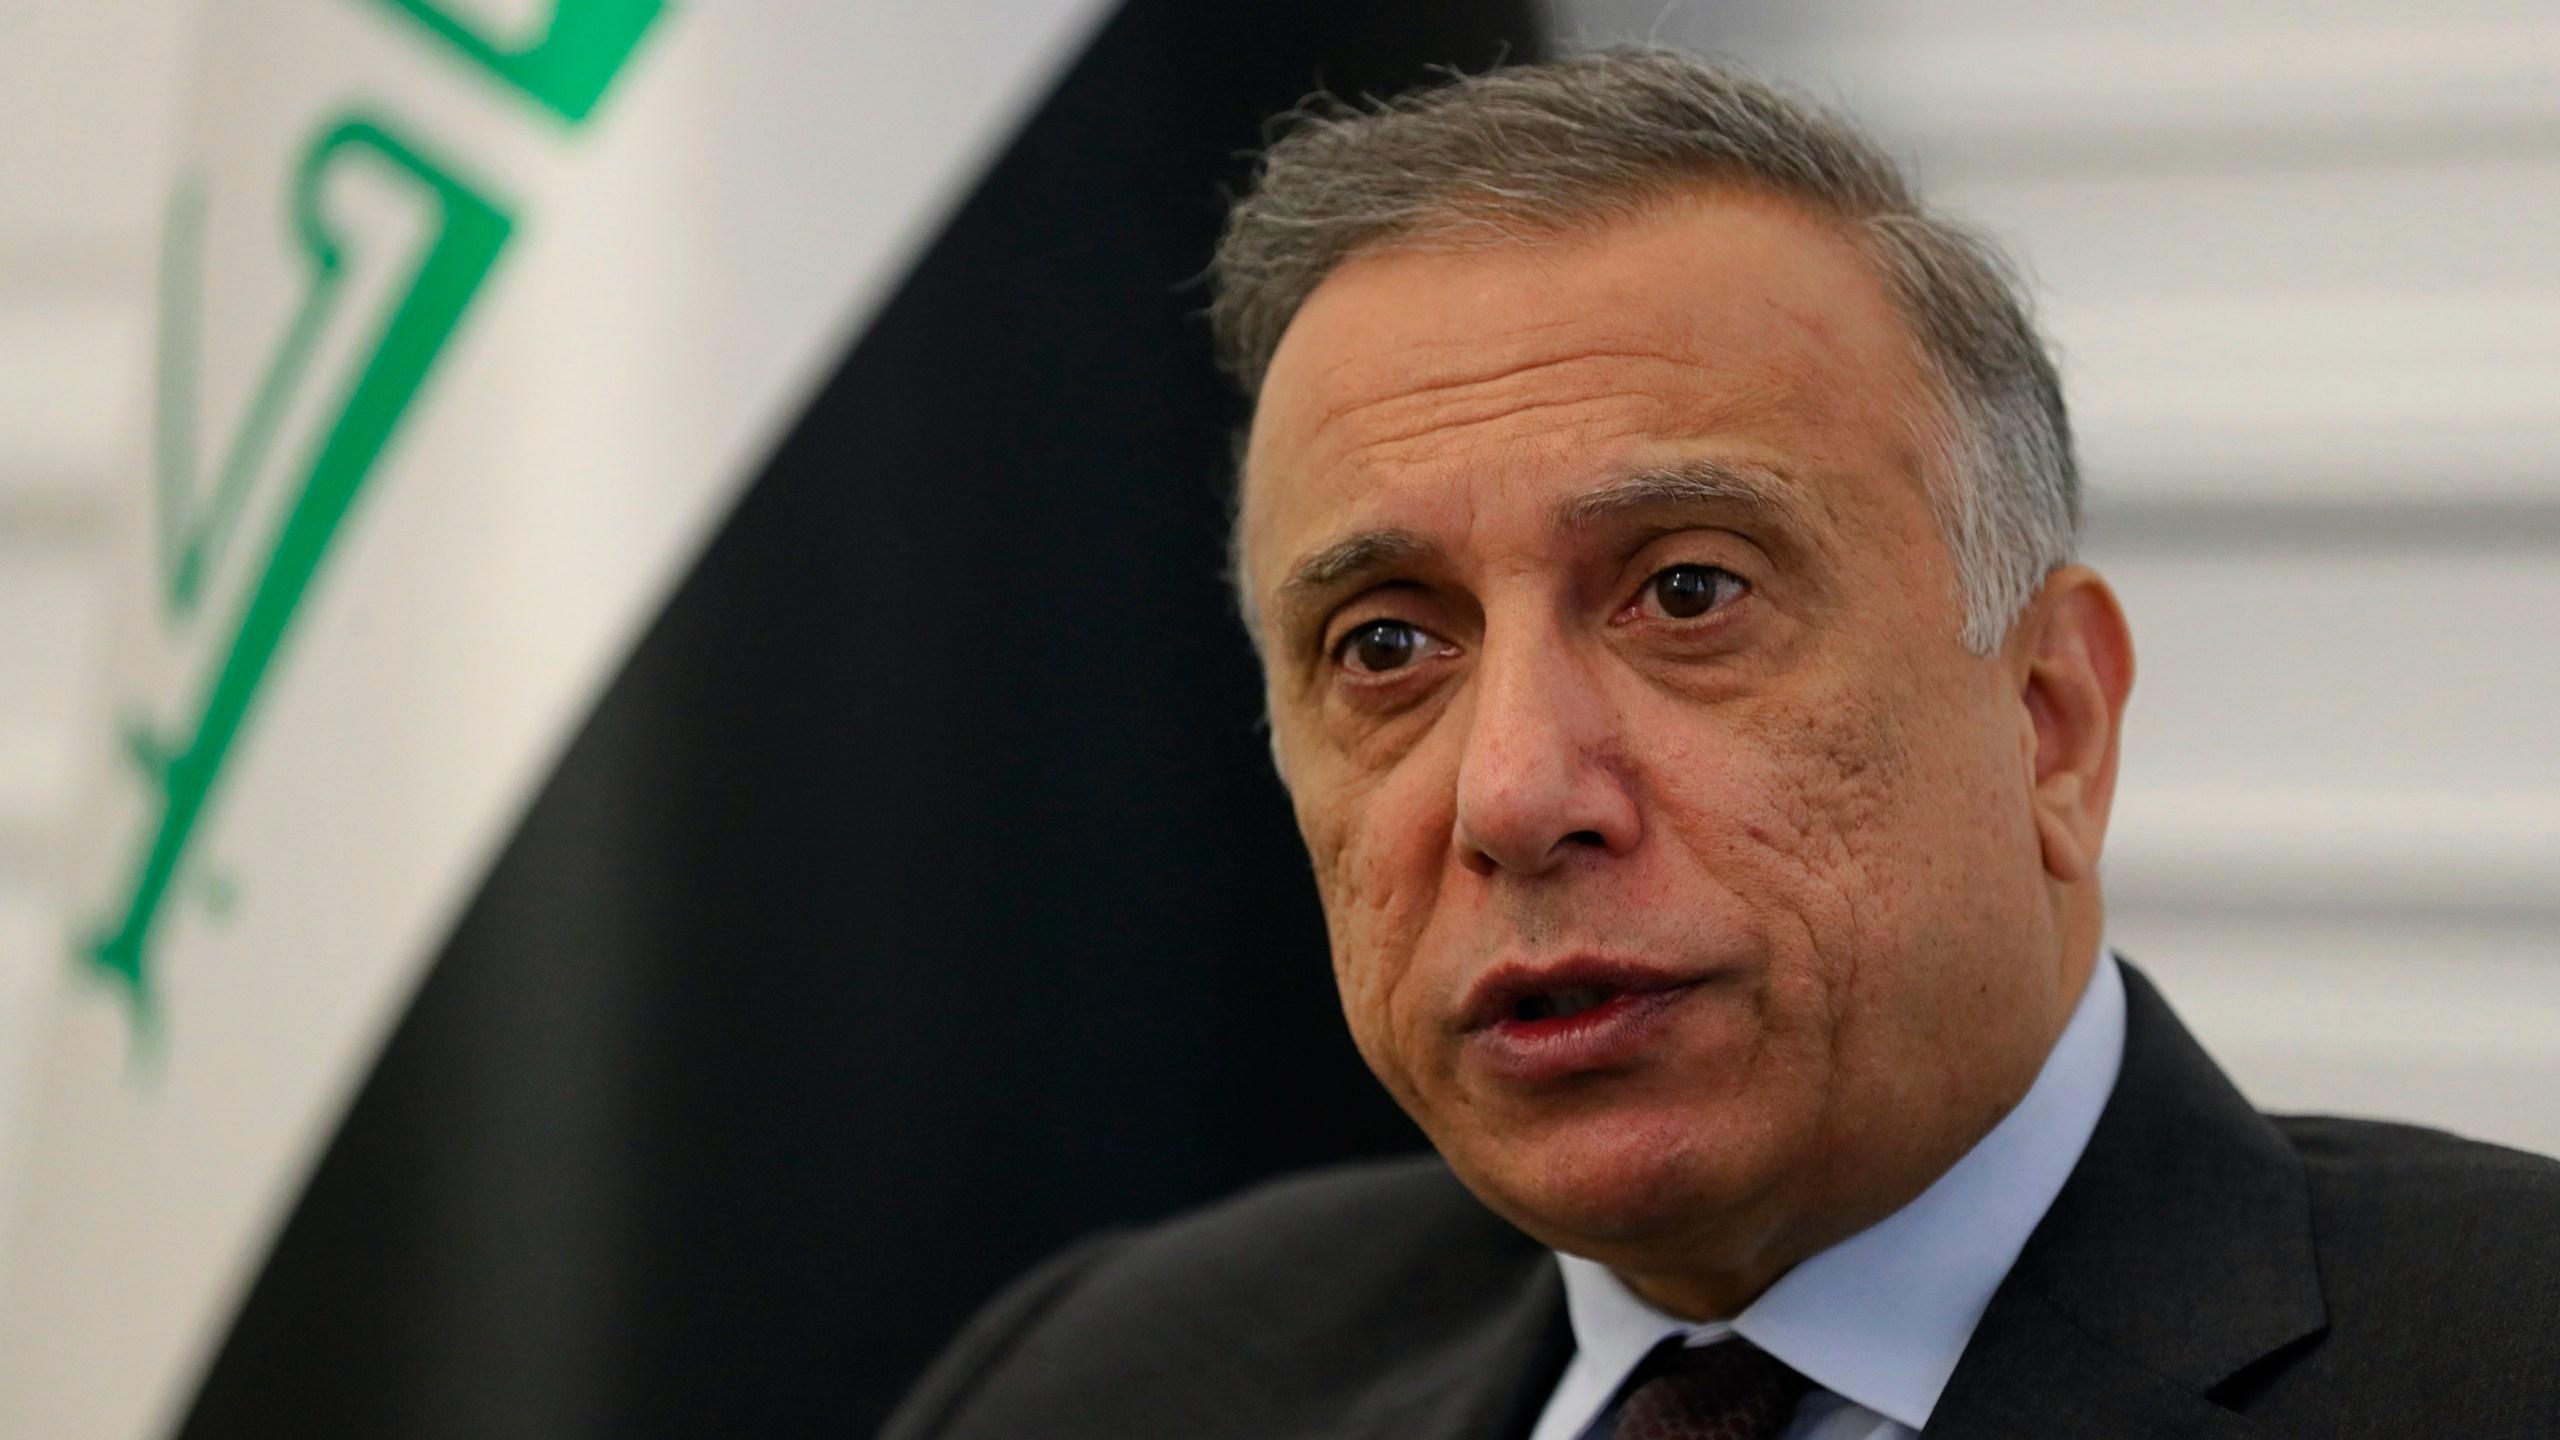 Mustafa al-Kadhimi